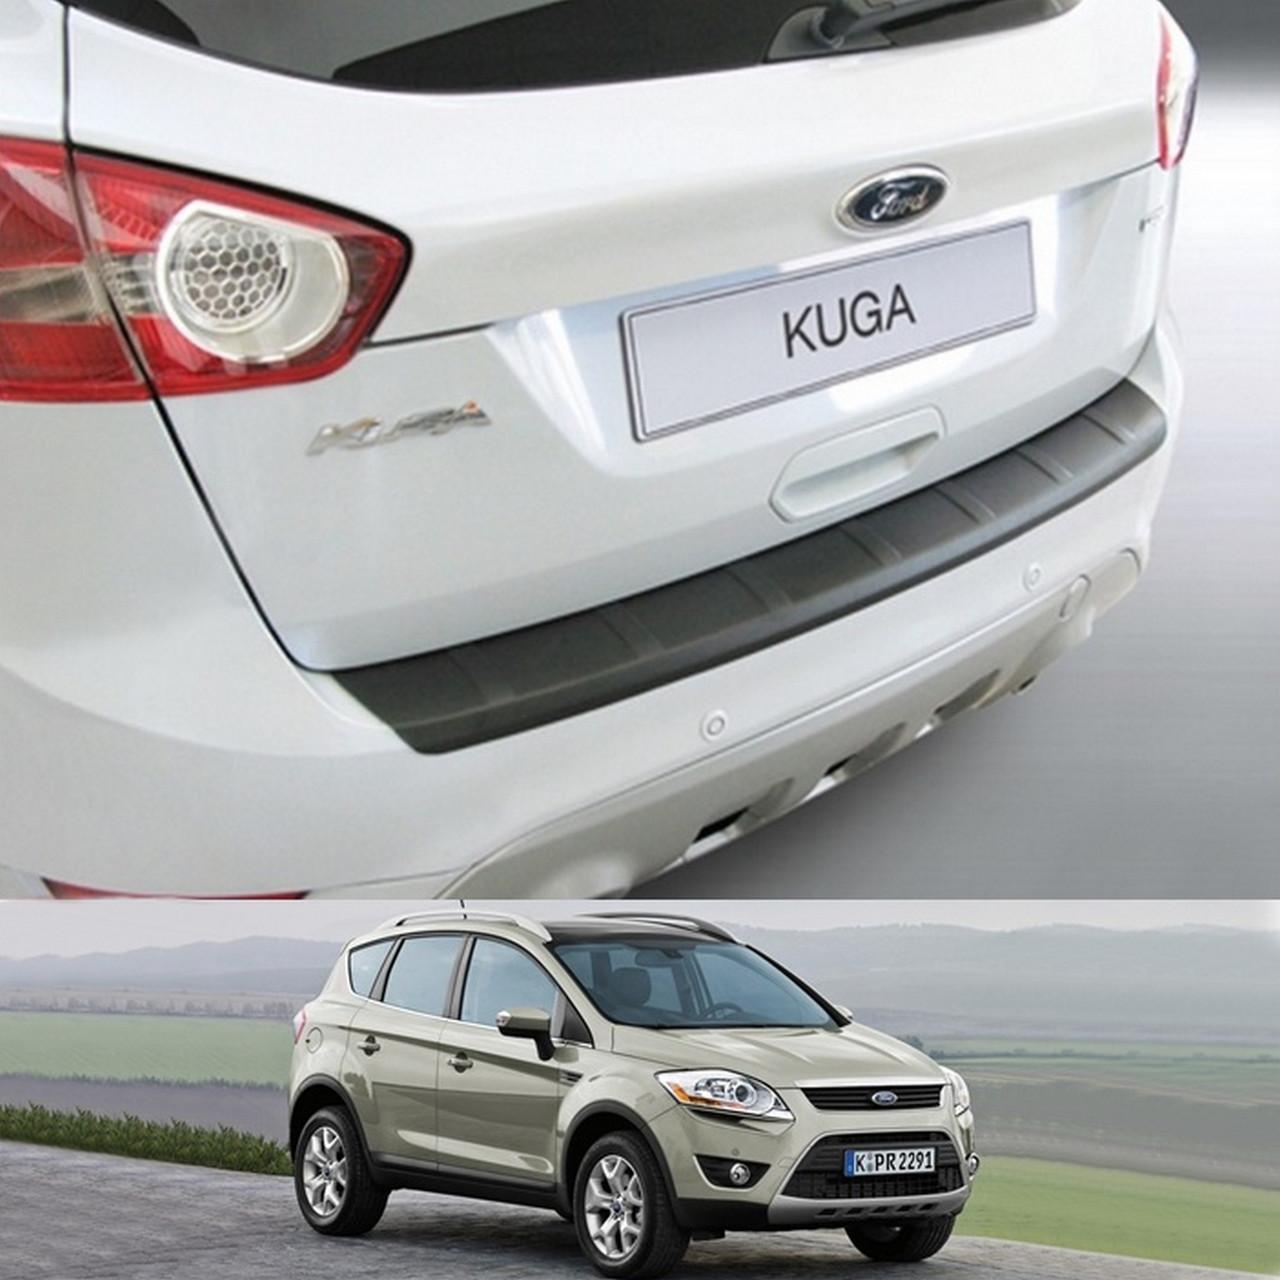 Пластикова захисна накладка на задній бампер для Ford Kuga Mk1 2008-2012